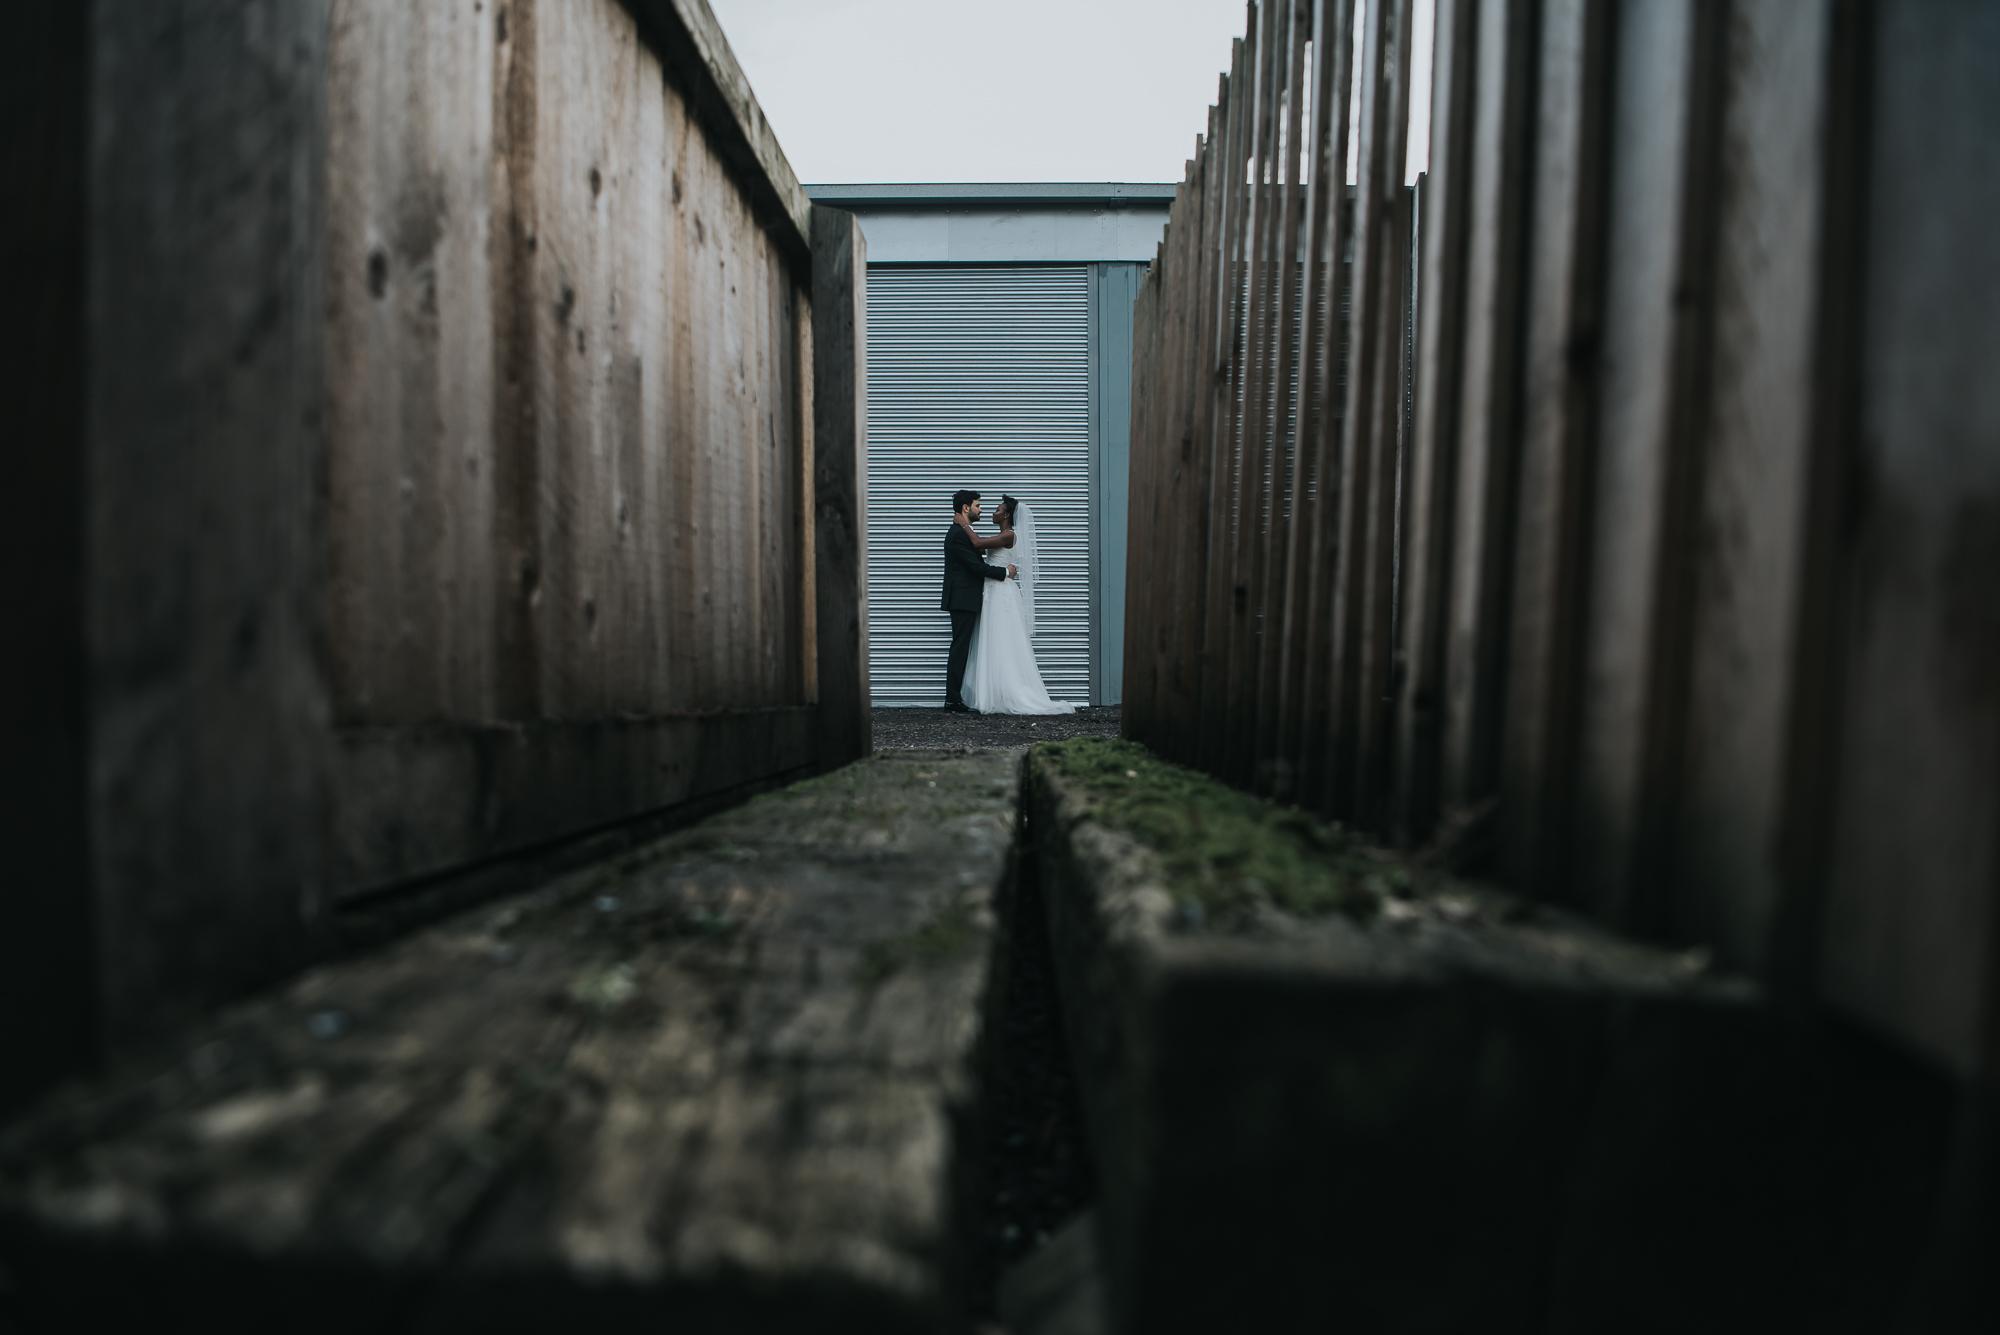 Owen HOuse Wedding Barn WEdding Photographer cheshire adam joe roberts photography (30 of 36).jpg